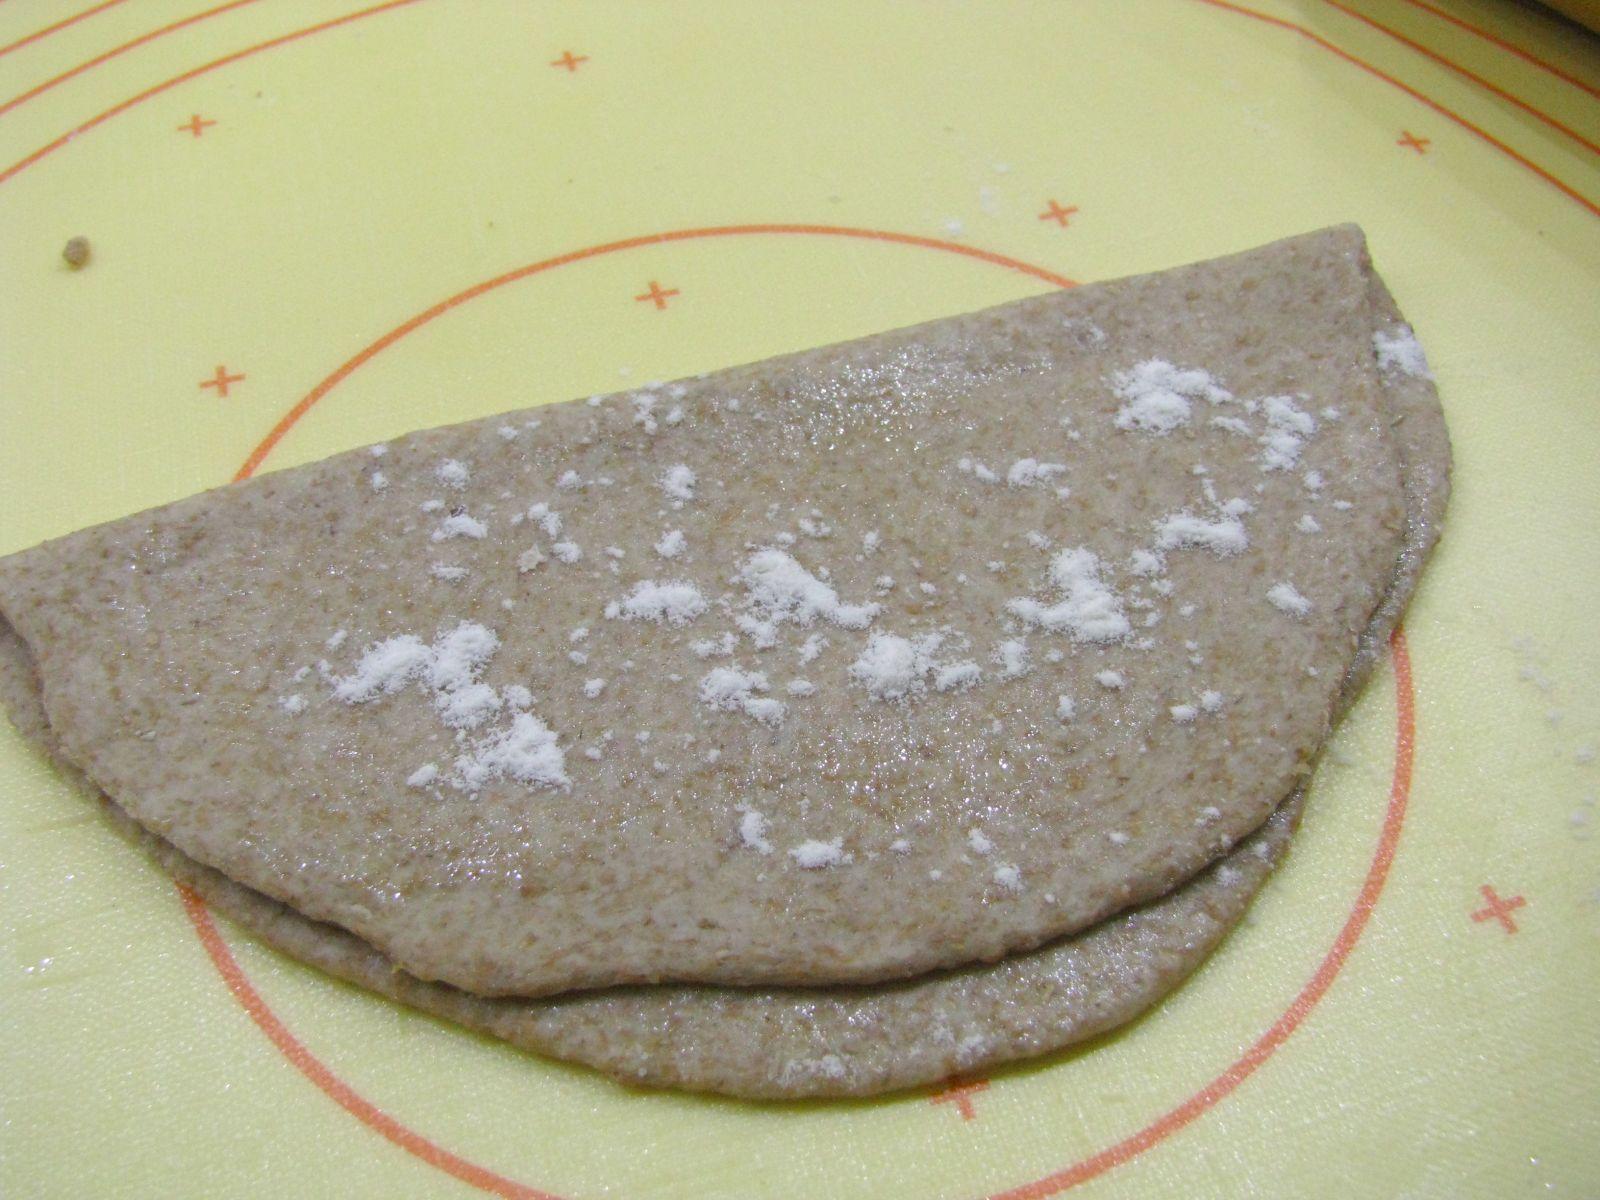 chapati prelozenie na polovicu